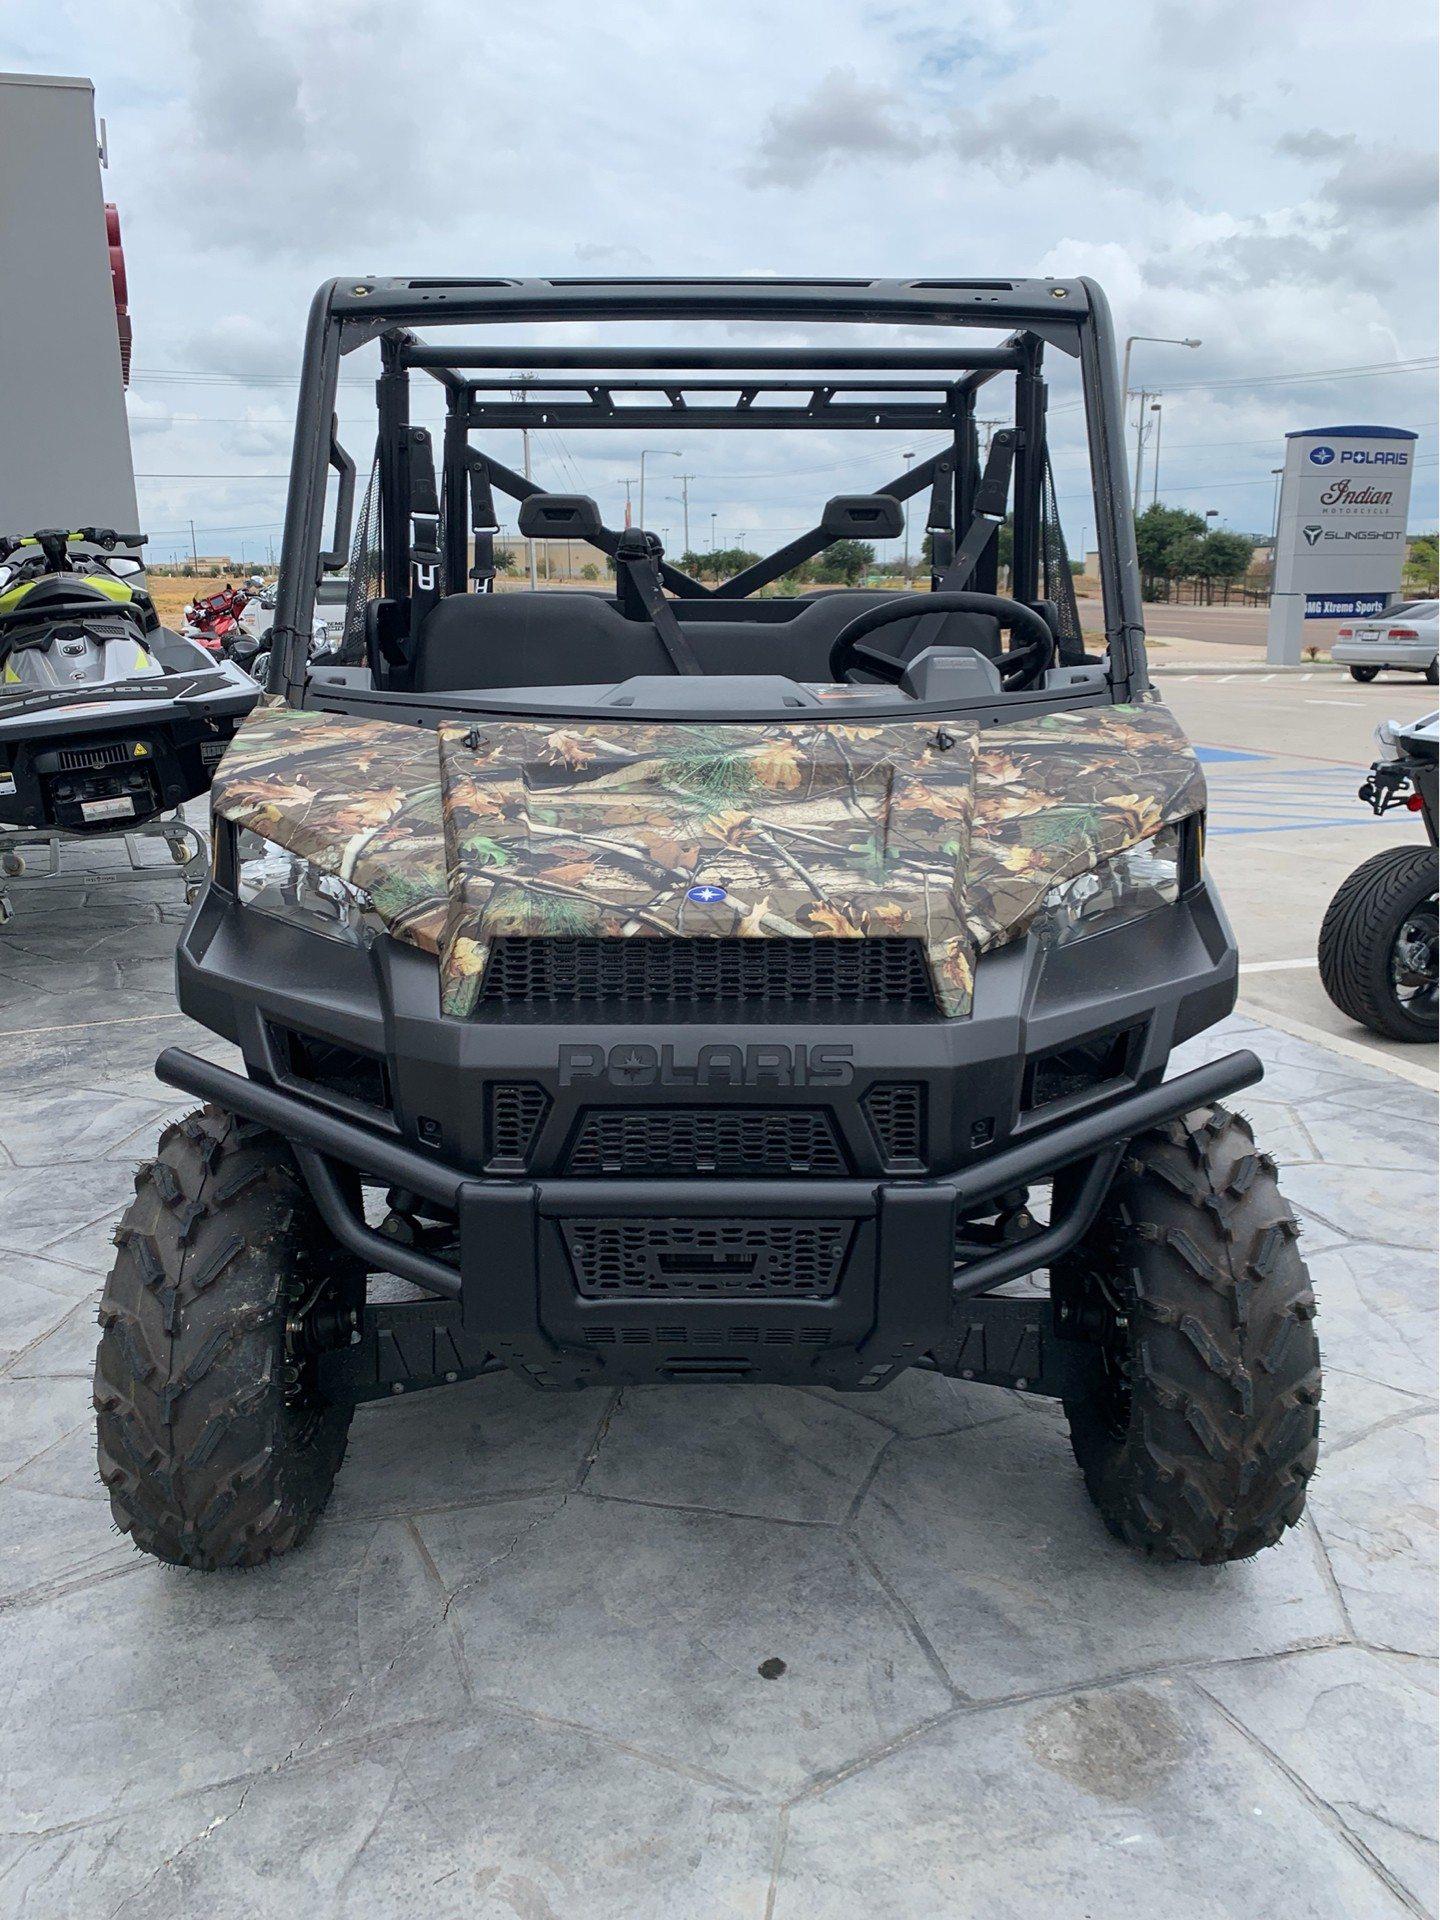 Polaris Ranger Crew 900 >> 2019 Polaris Ranger Crew Xp 900 Eps In Laredo Texas